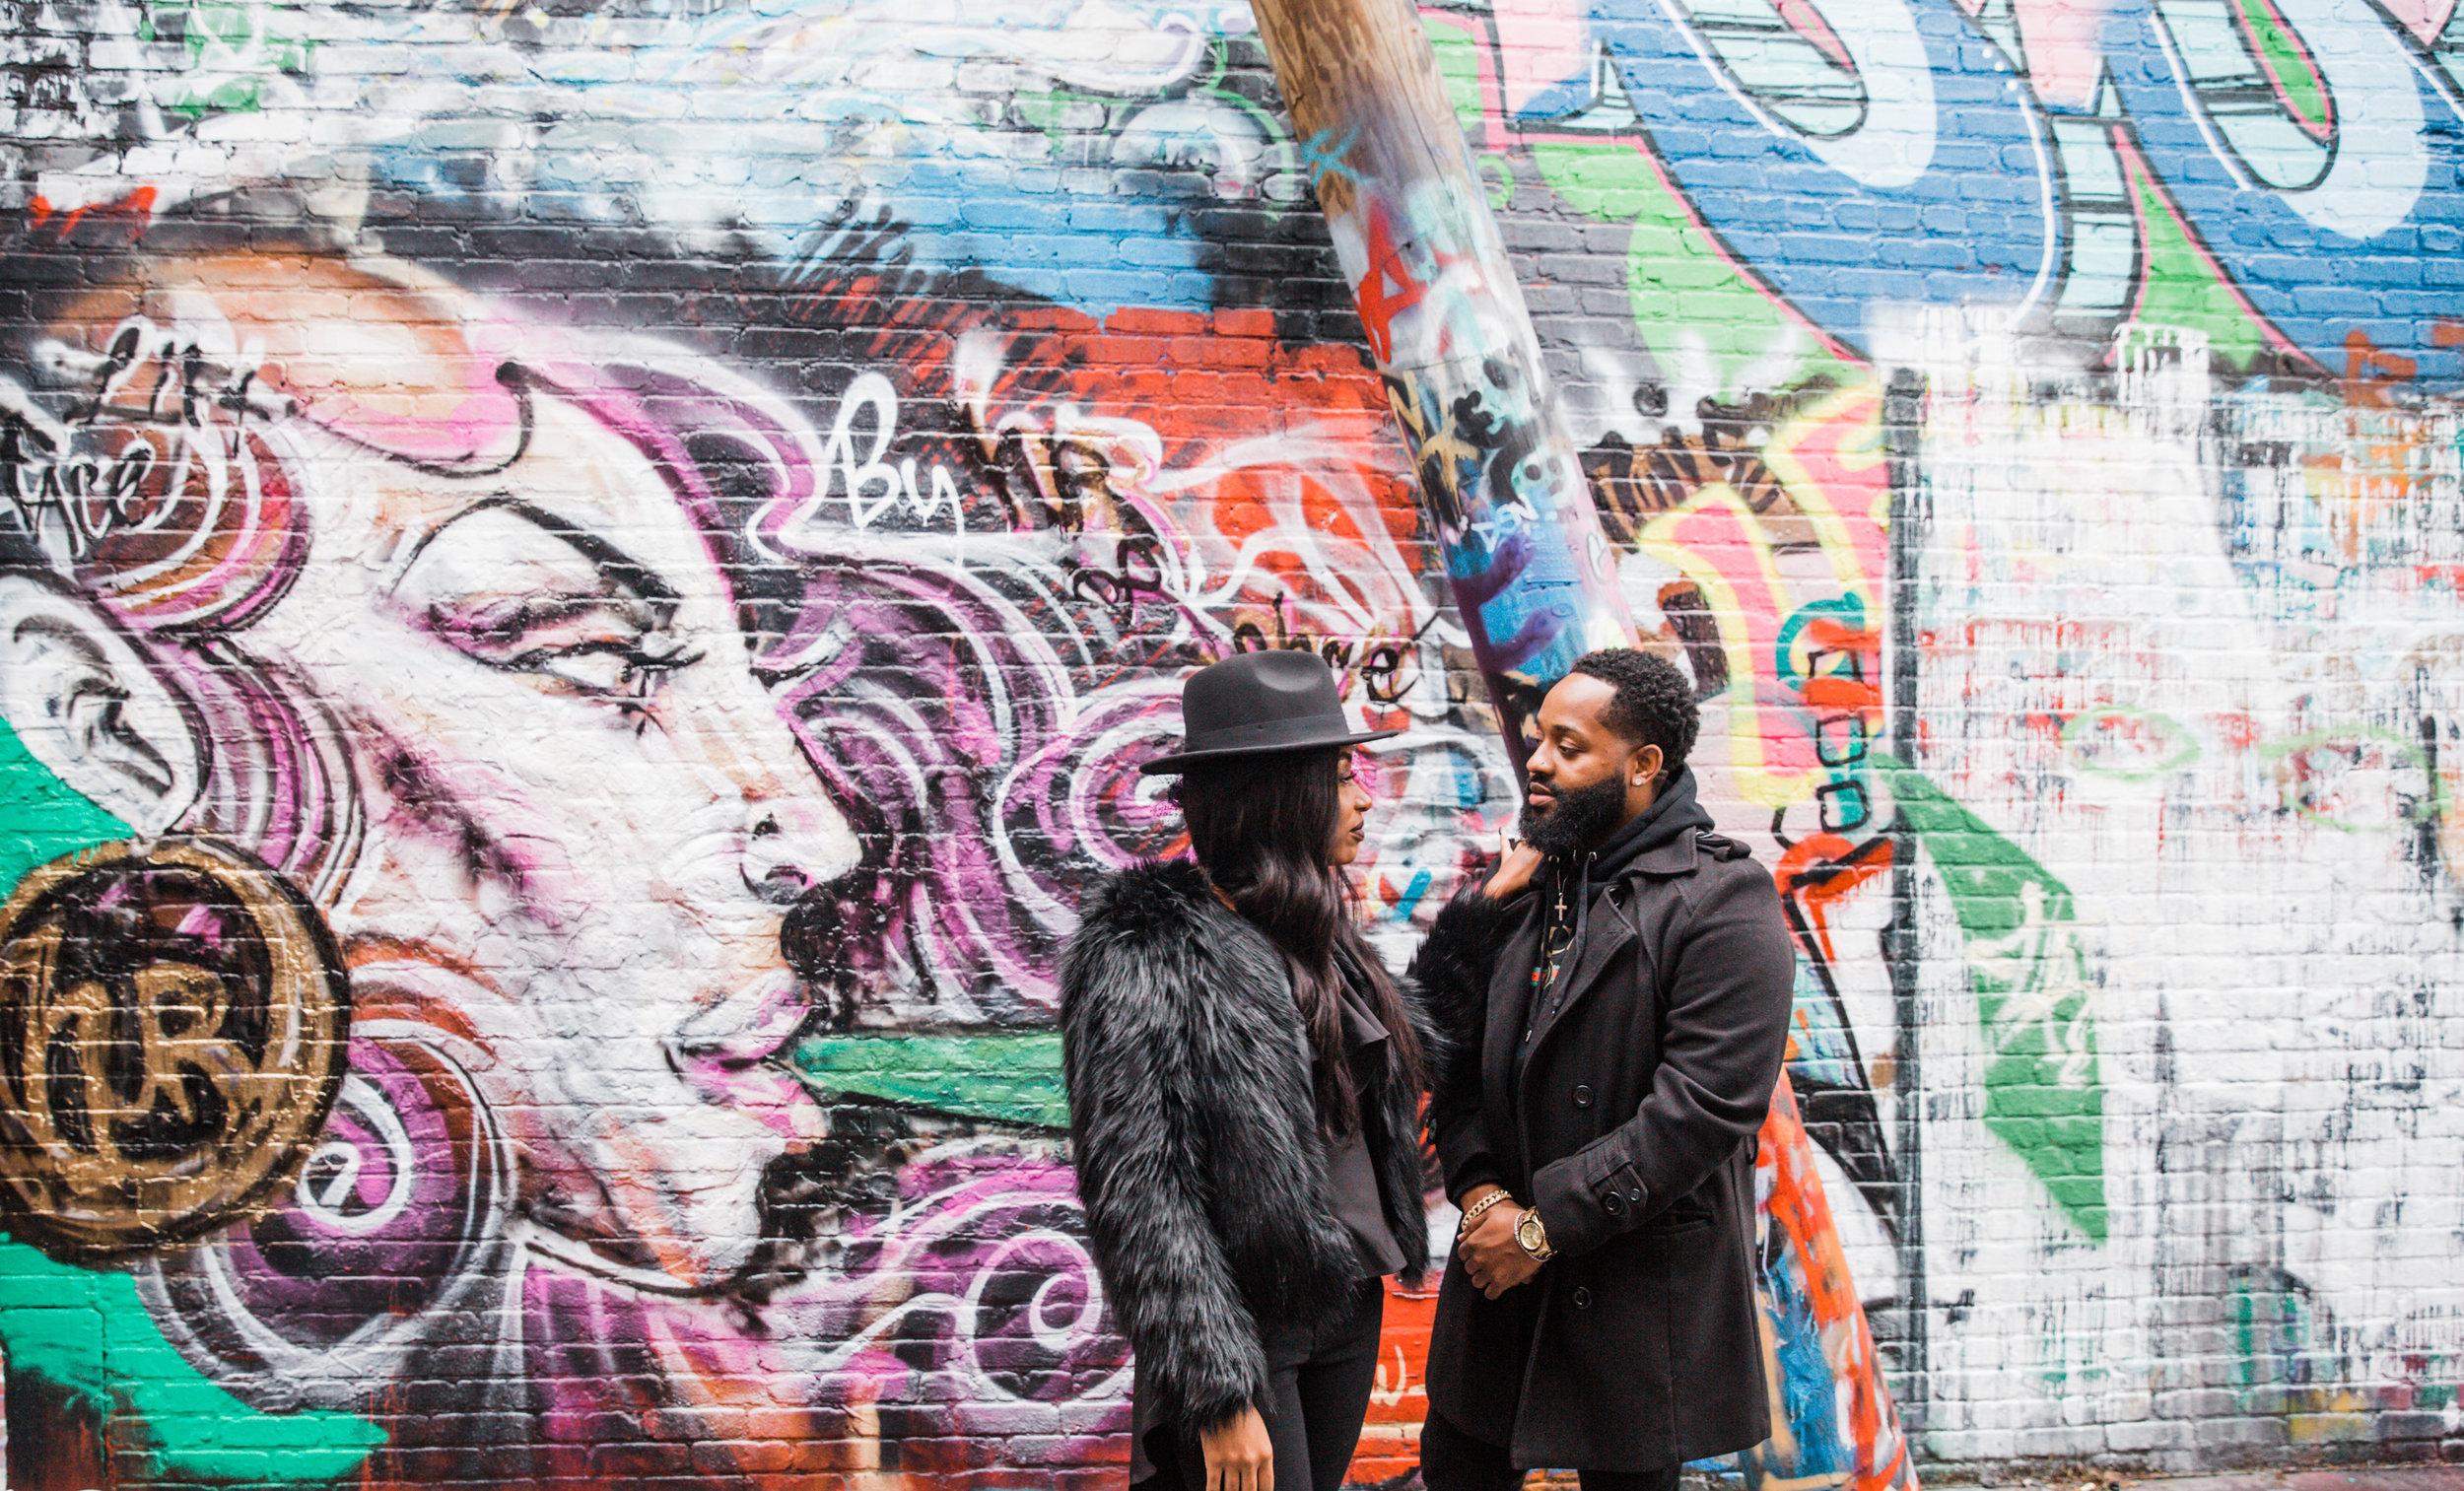 Creative Baltimore Graffiti Alley Engagement Session Megapixels Media Photography-35.jpg